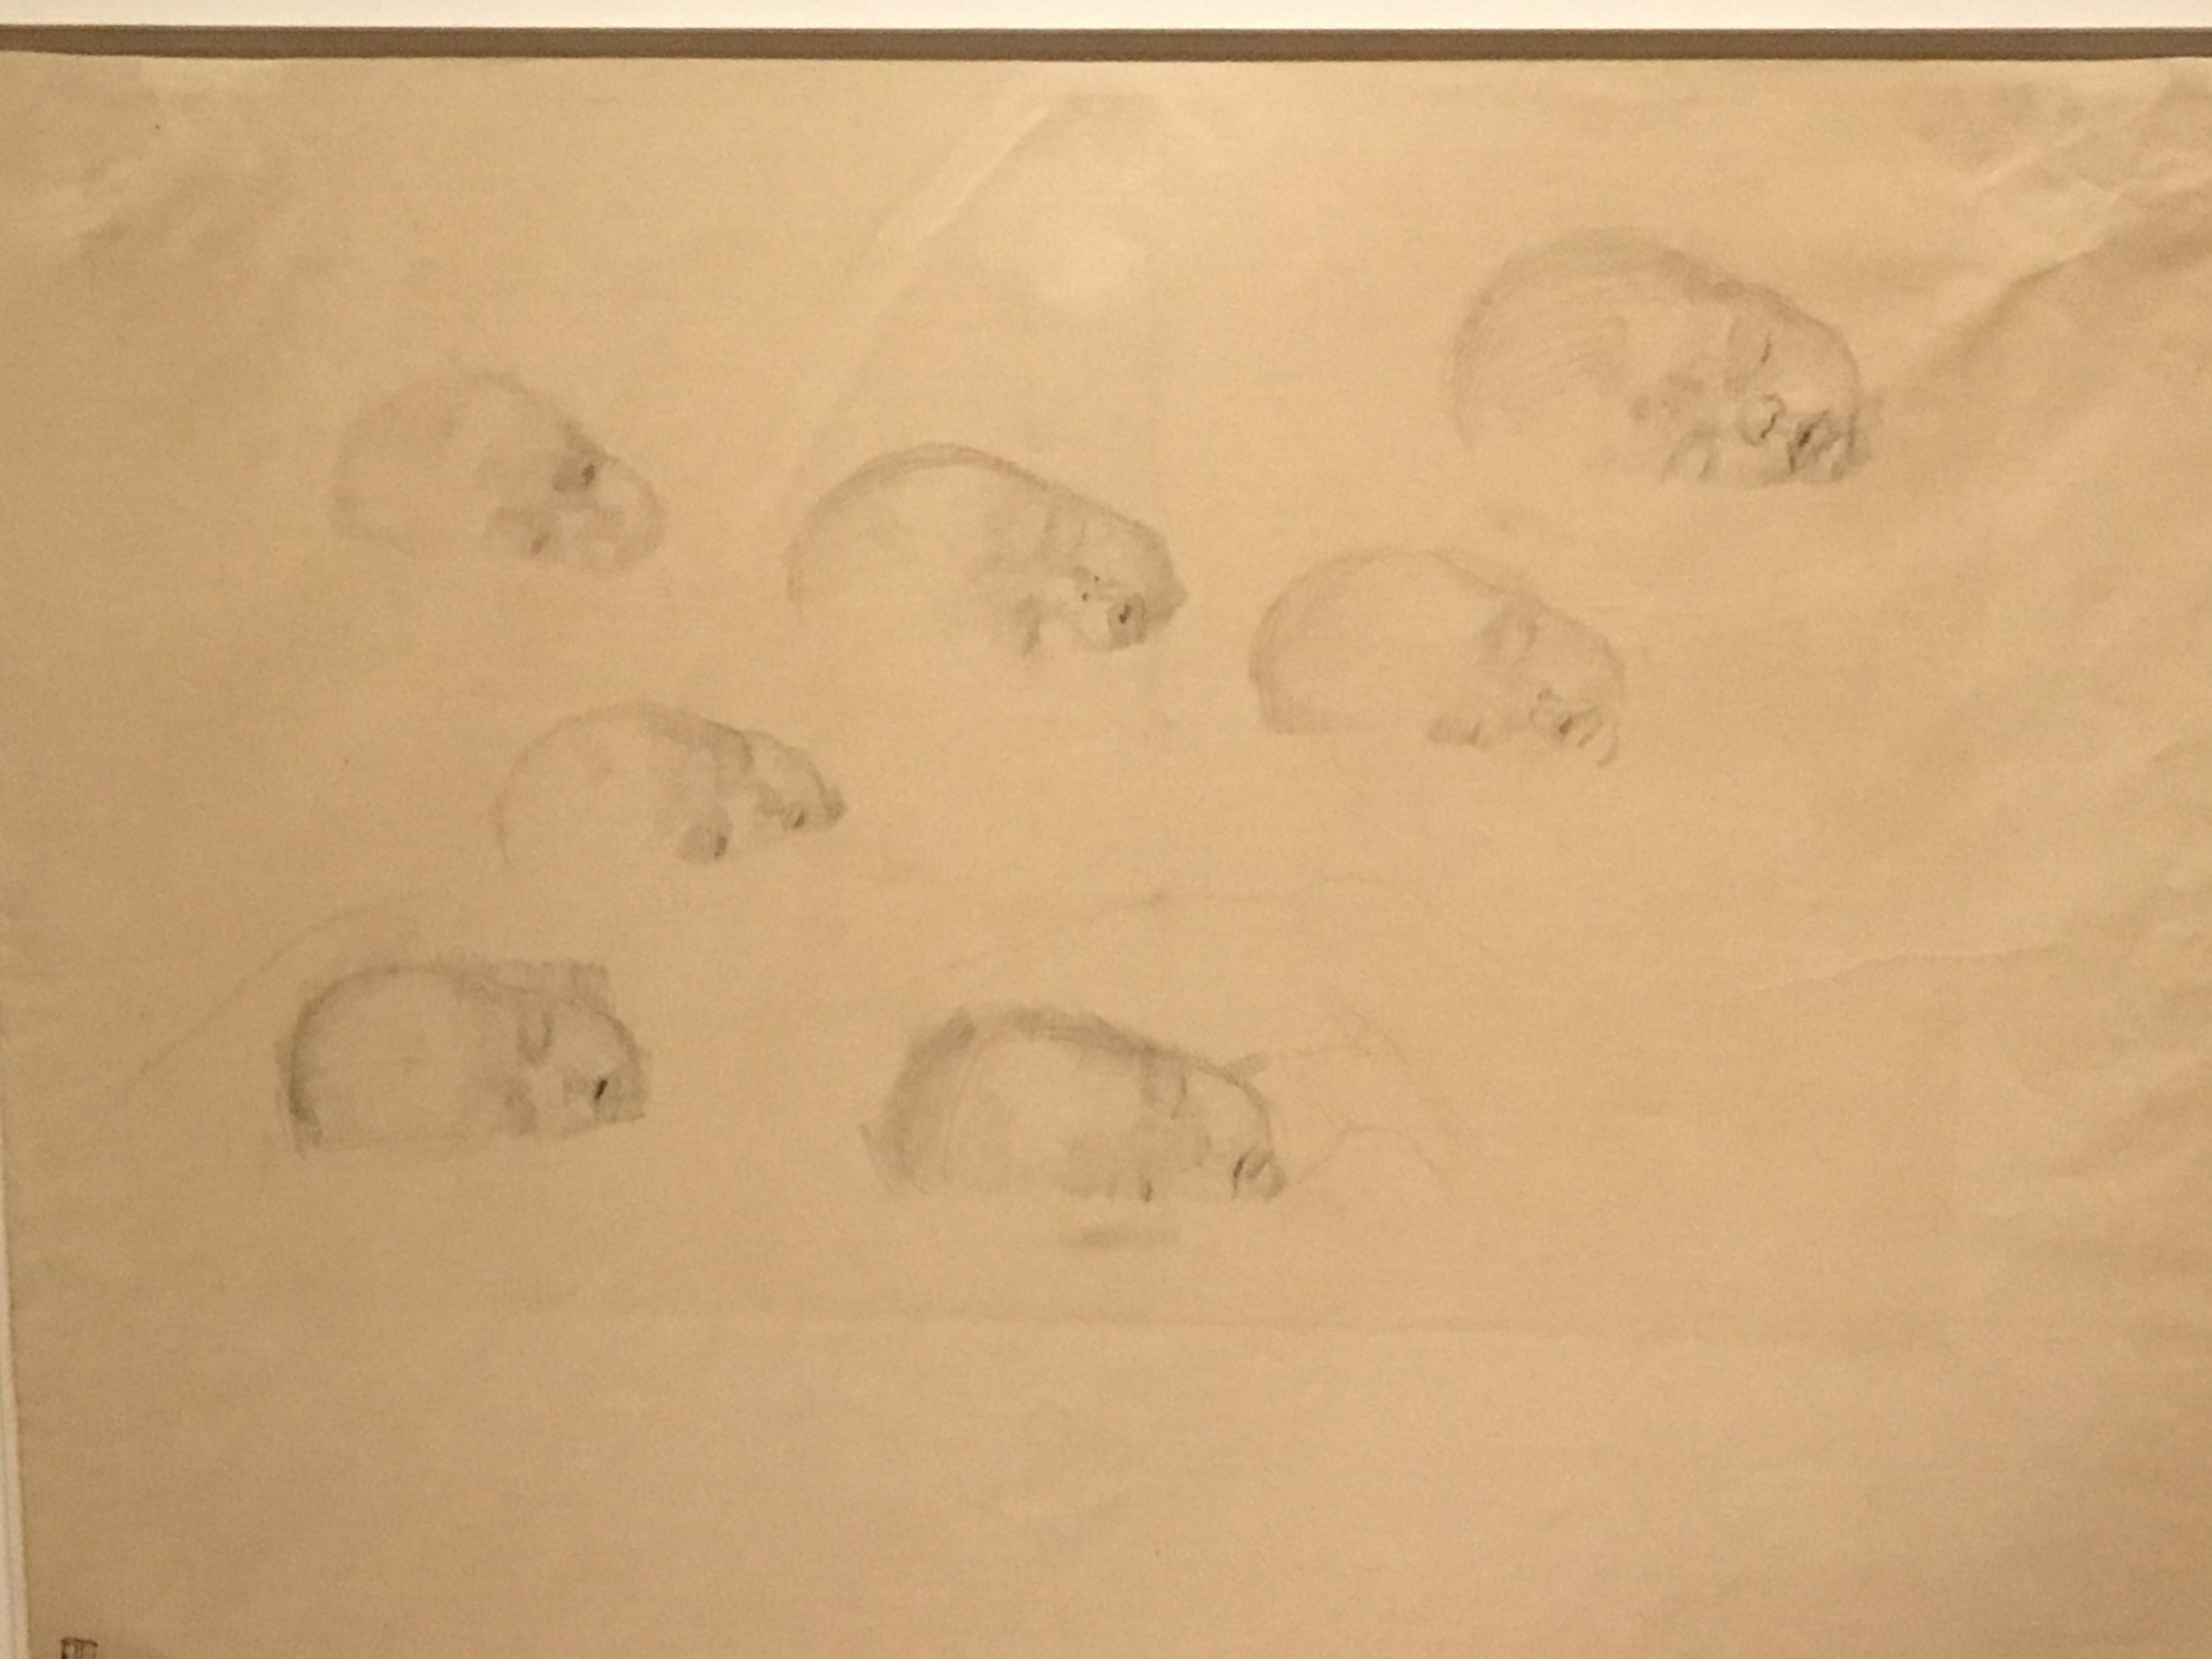 """Seven studies of infants"" by Kathe Kollwitz"